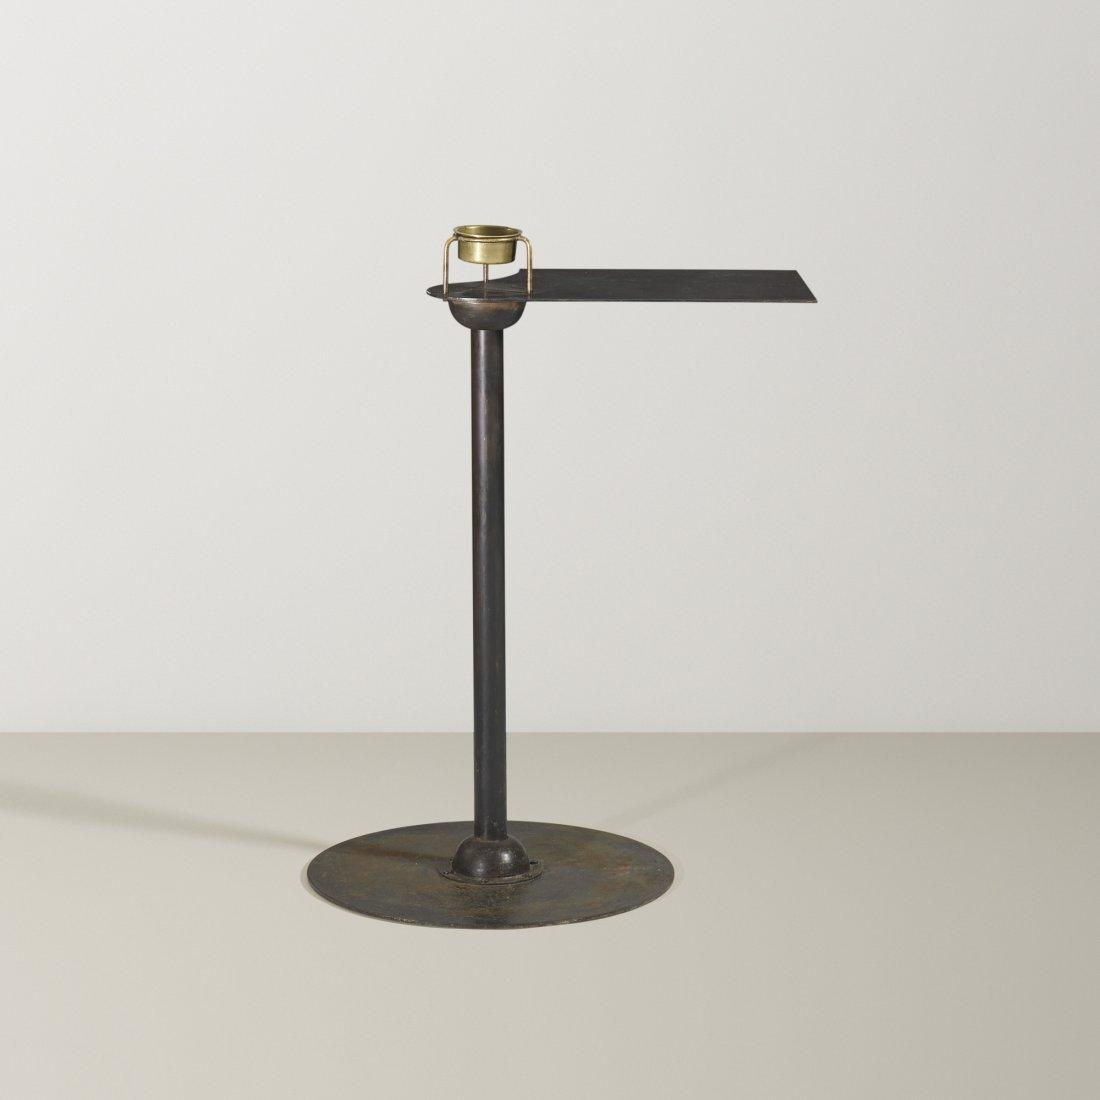 Pierre Chareau Smoker's table, model no. SN9